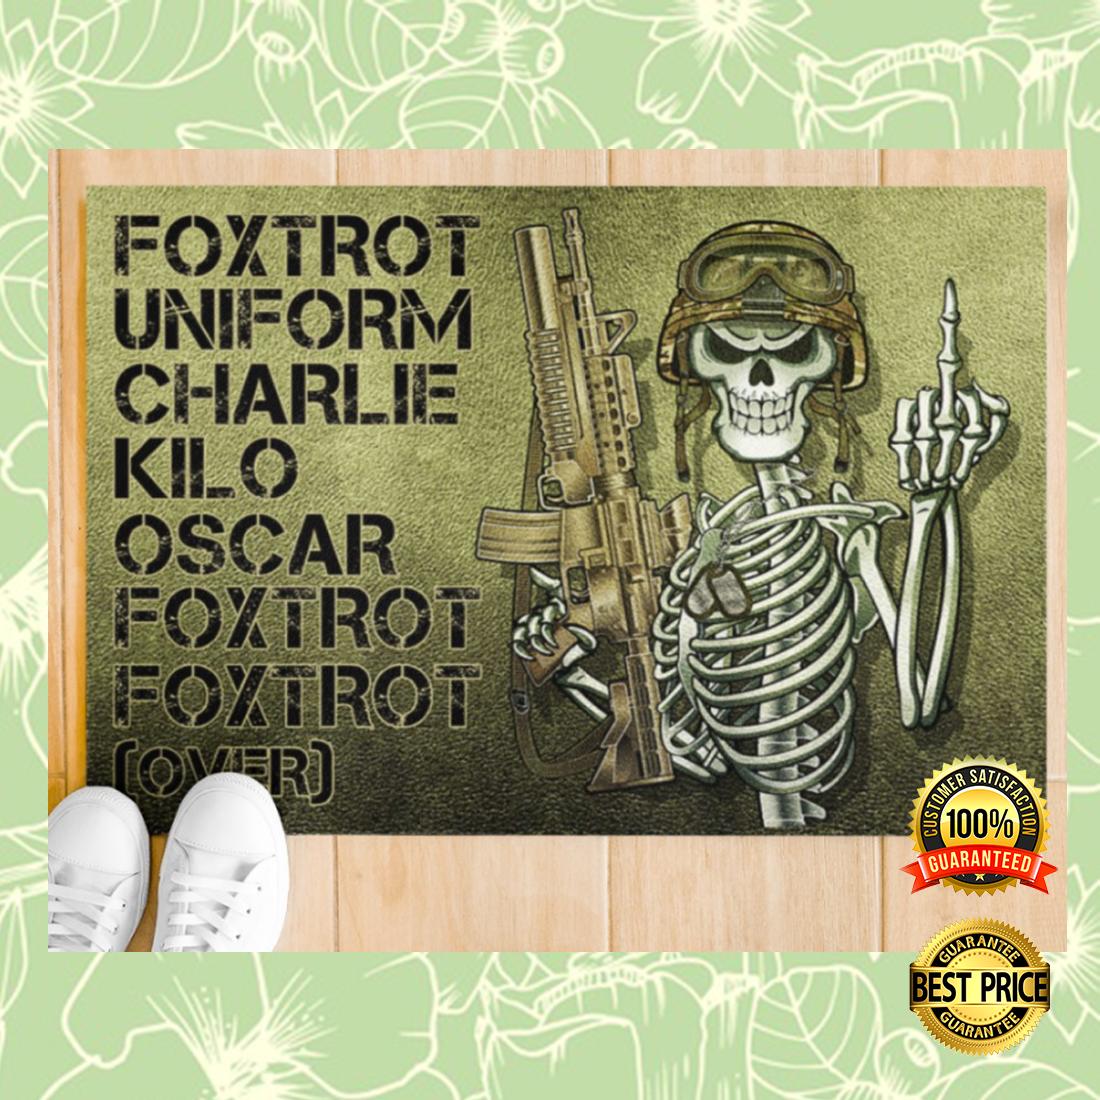 FOXTROT UNIFORM CHARLIE KILO OSCAR FOXTROT FOXTROT OVER DOORMAT 6